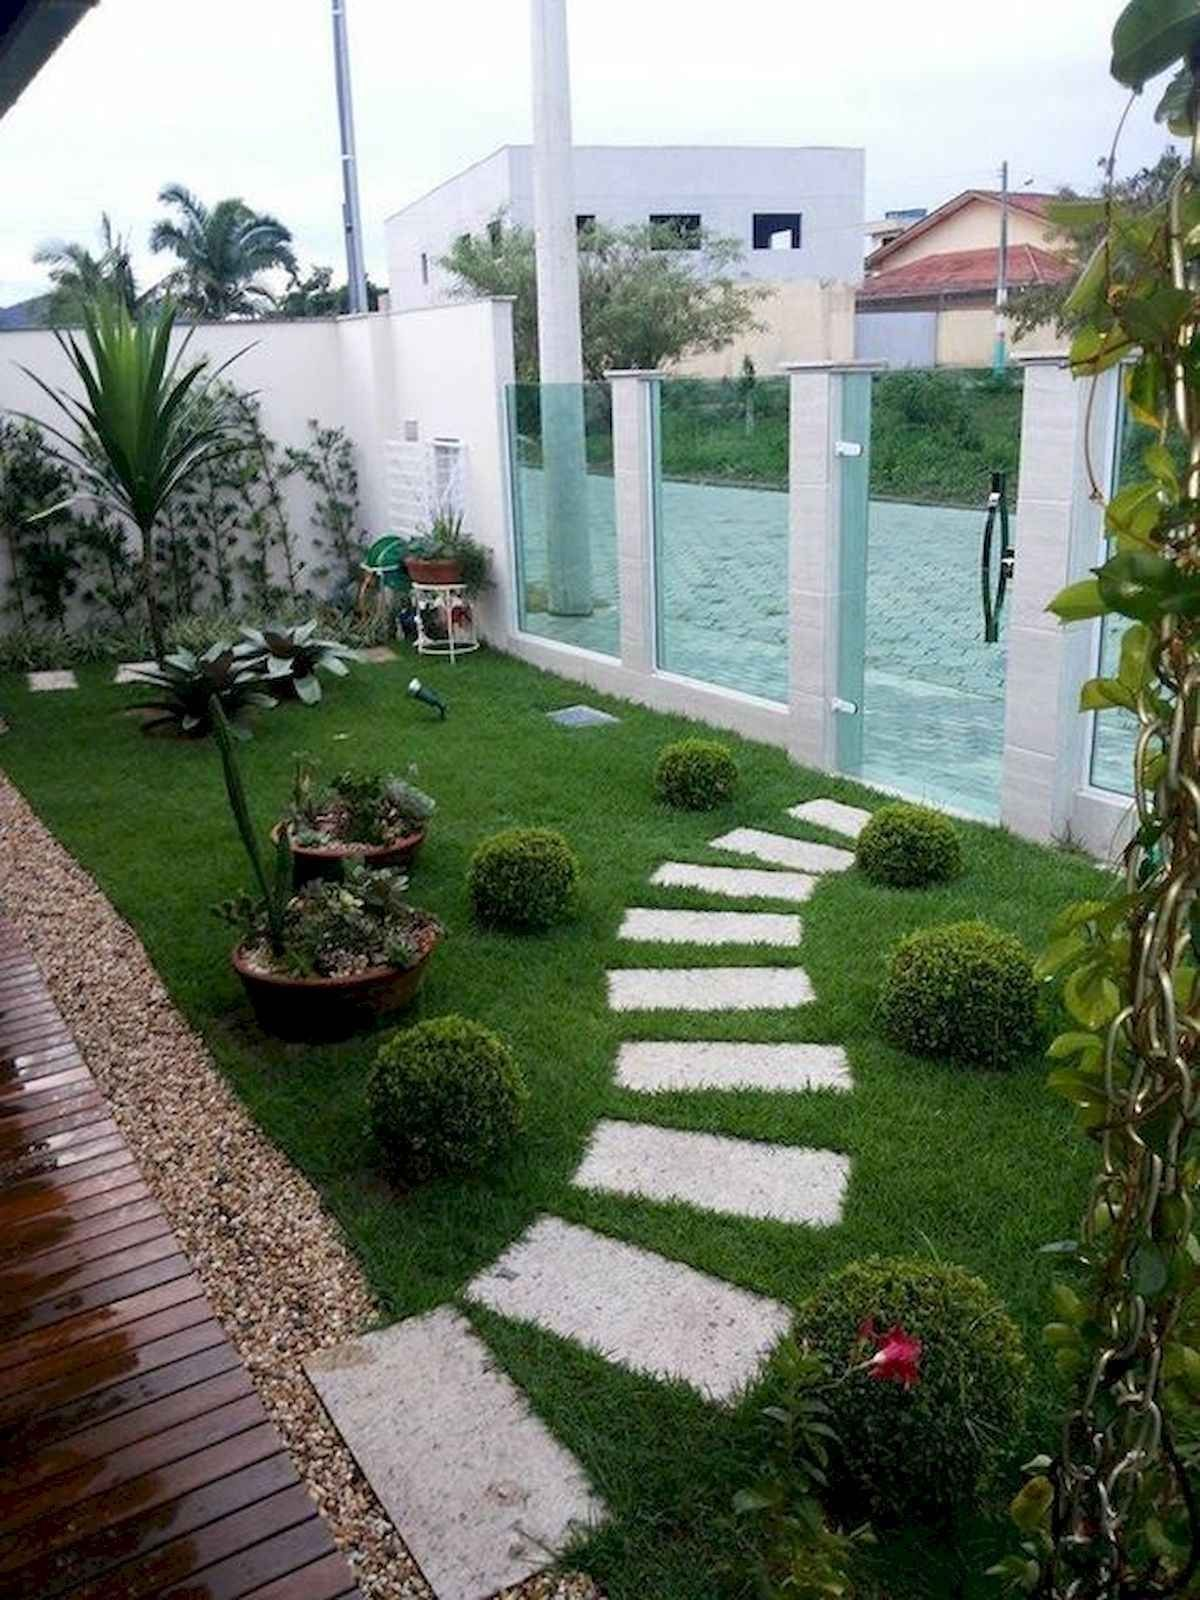 48 Cool Outdoor Landscape Design Ideas In 2020 Small Front Yard Landscaping Front Yard Landscaping Design Garden Design